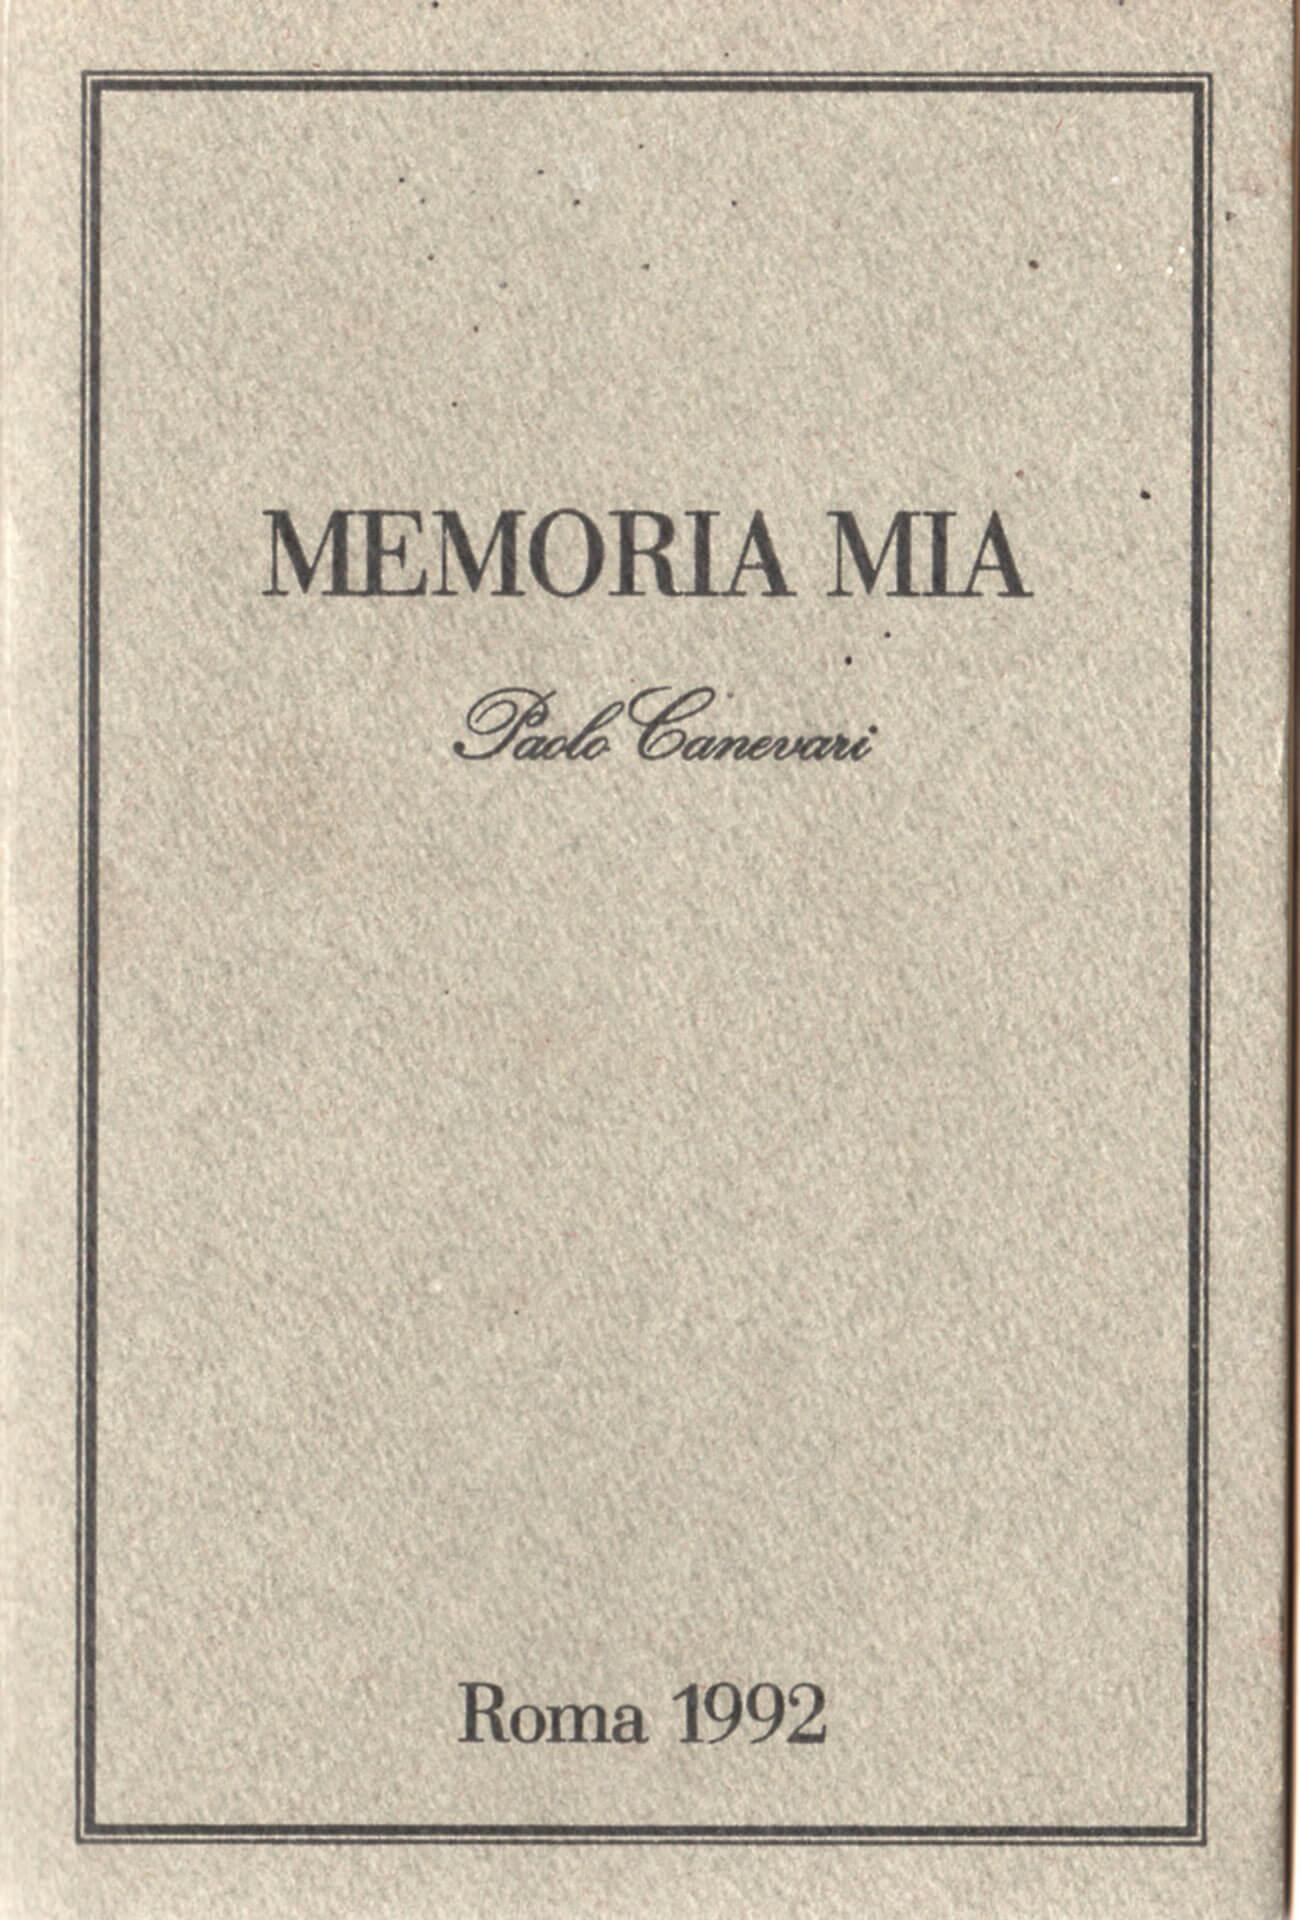 Studio Stefania Miscetti | Catalogues | Paolo Canevari | Memoria mia